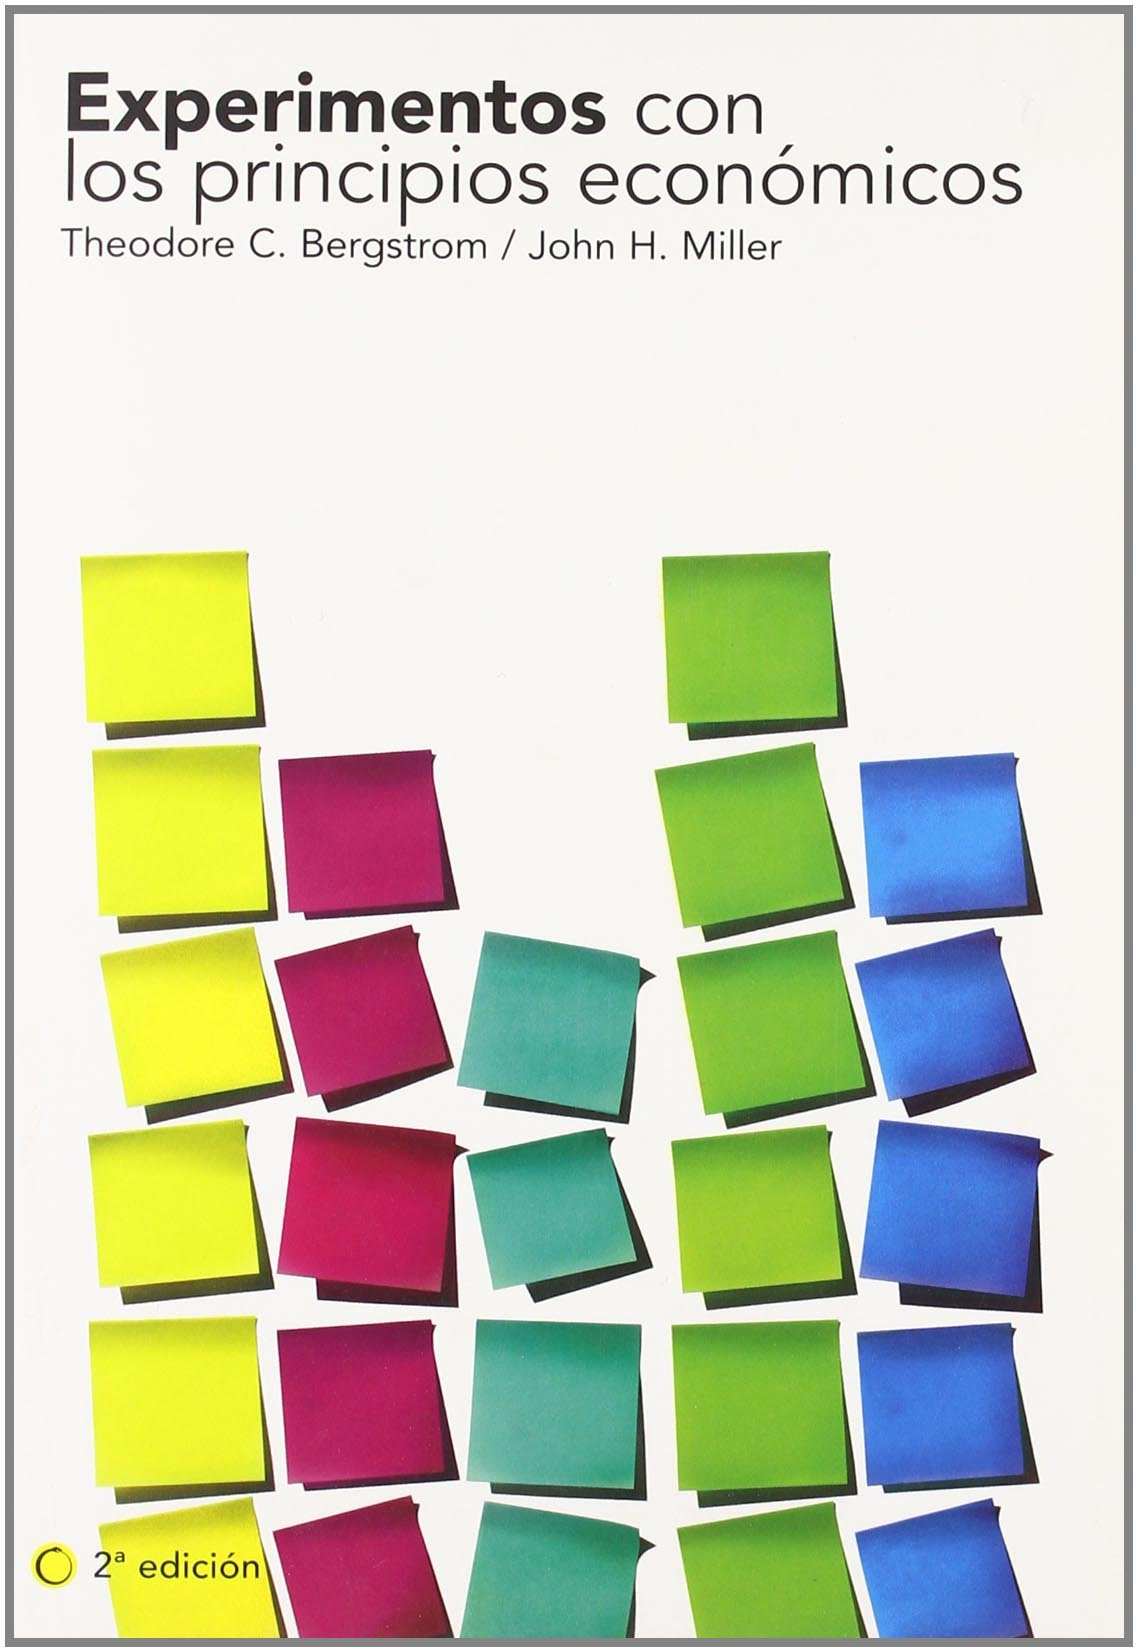 Experimentos con los principios económicos, 2ª ed. (Economía) Tapa blanda – 1 ene 2009 Theodore C. Bergstrom John H. Miller Esther Rabasco Antoni Bosch Editor